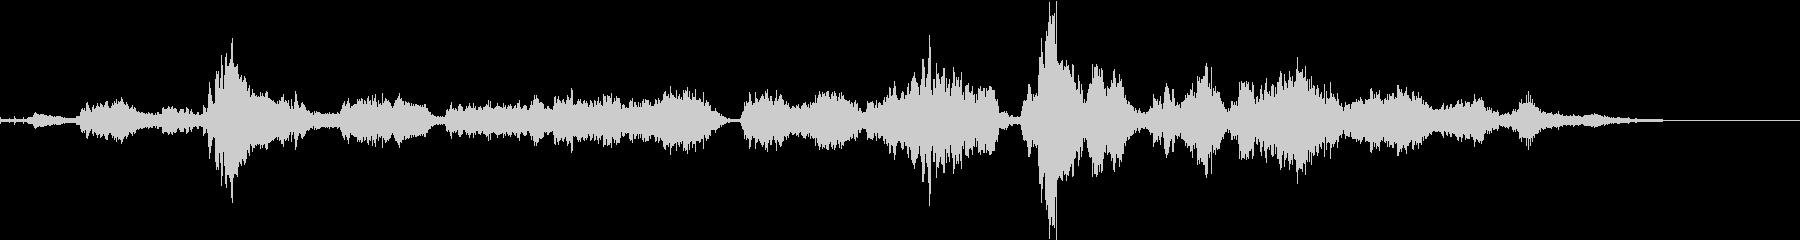 sitarアトモスフィア系女性voiceの未再生の波形